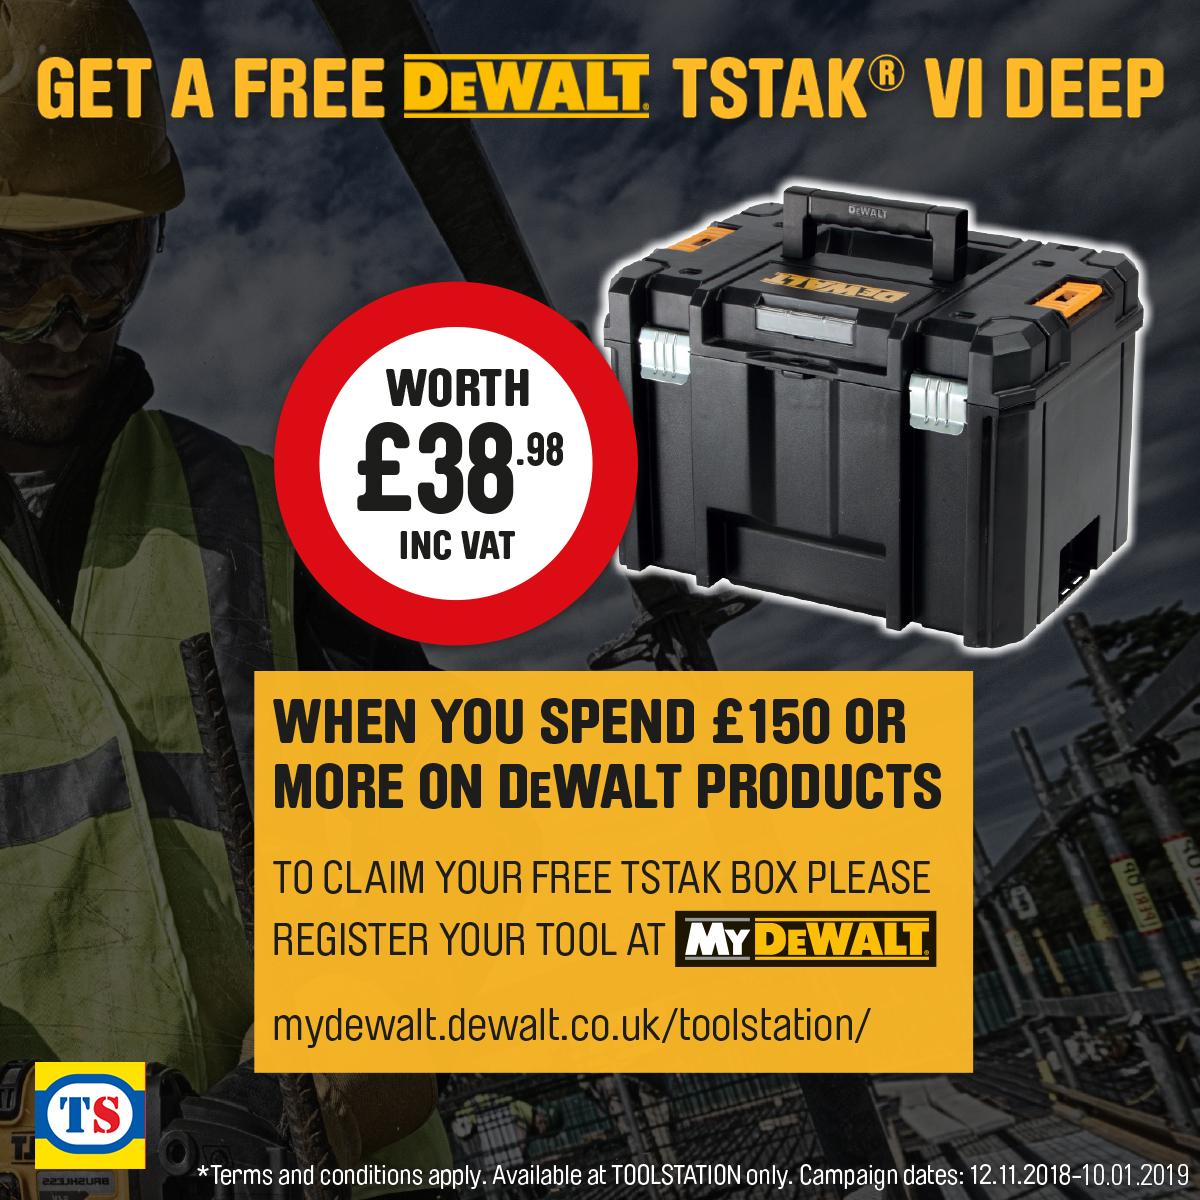 Free DeWALT TSTAK VI Deep when you spend £150 or more on DeWALT Products